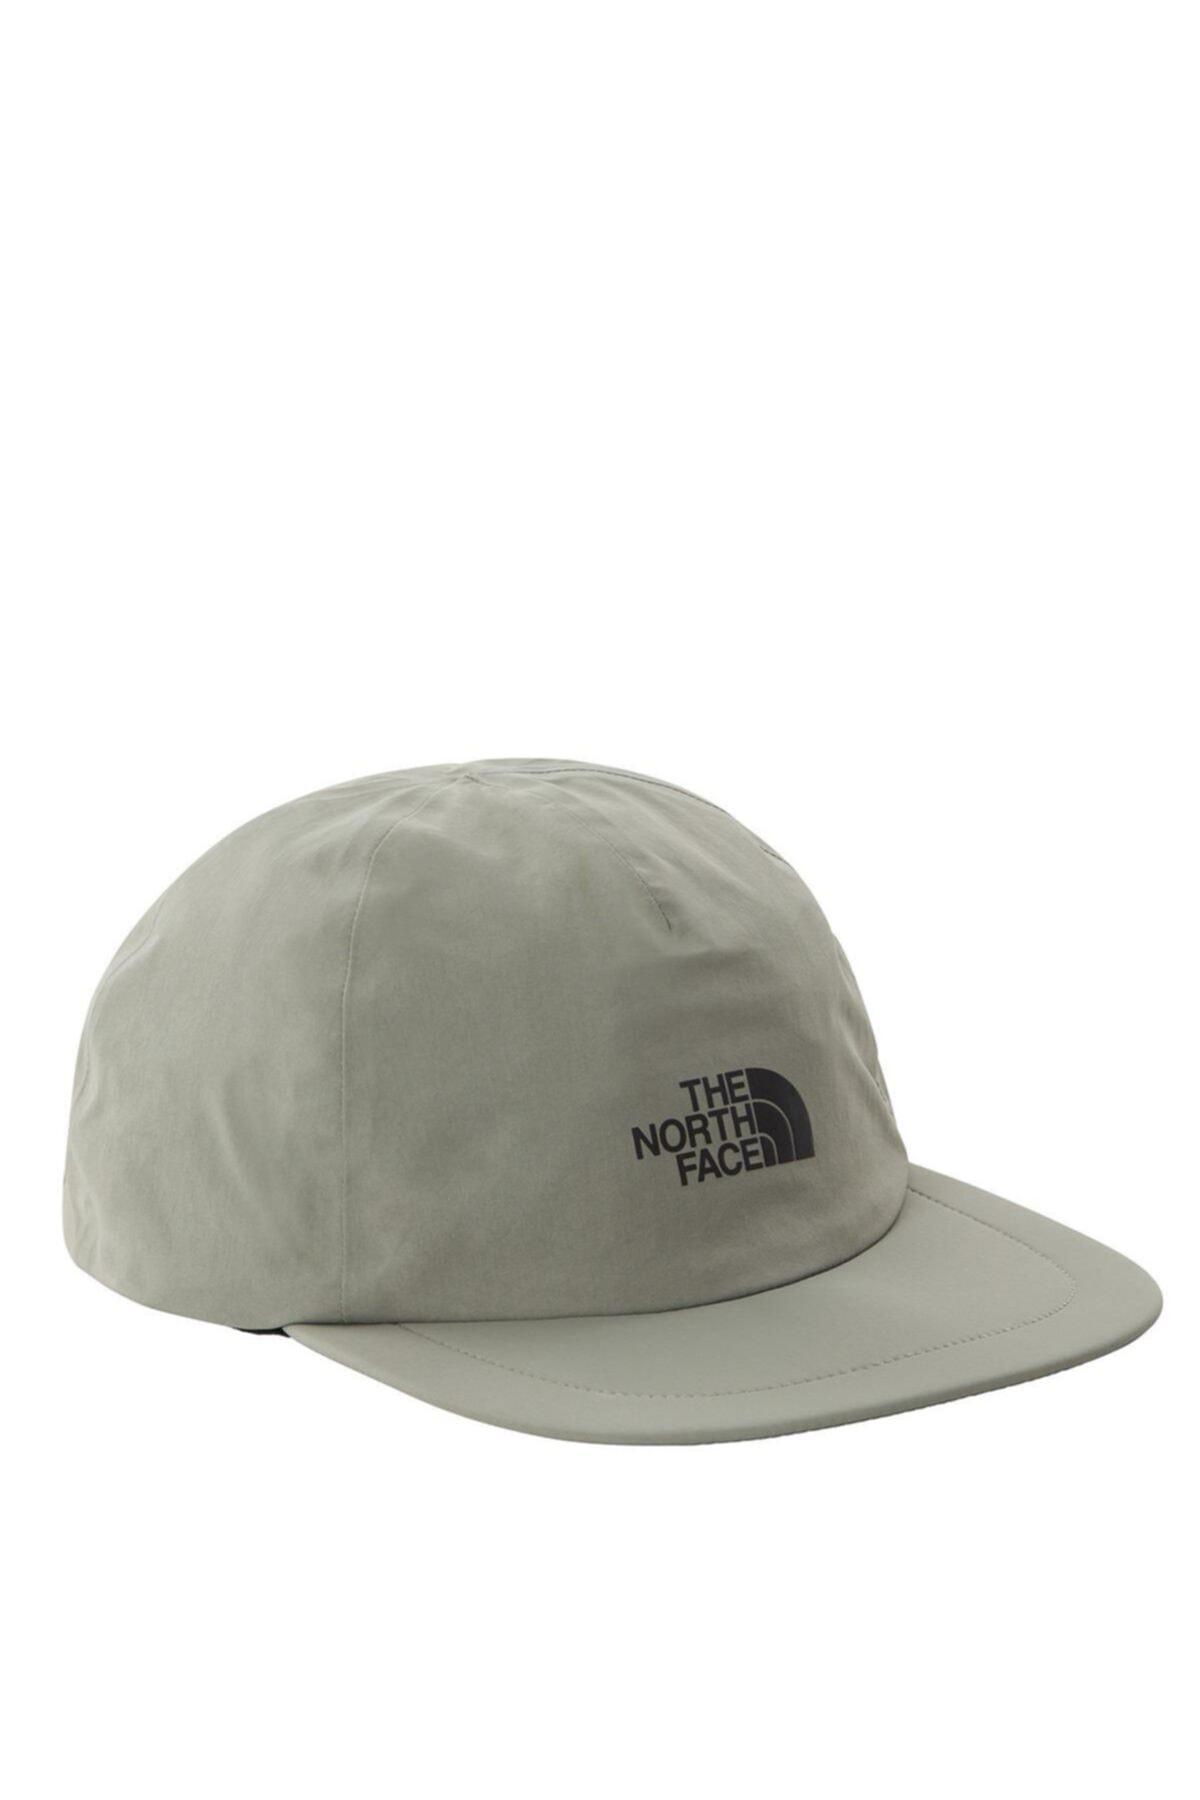 THE NORTH FACE Cıty Crush Futurelıght Şapka Unisex 1